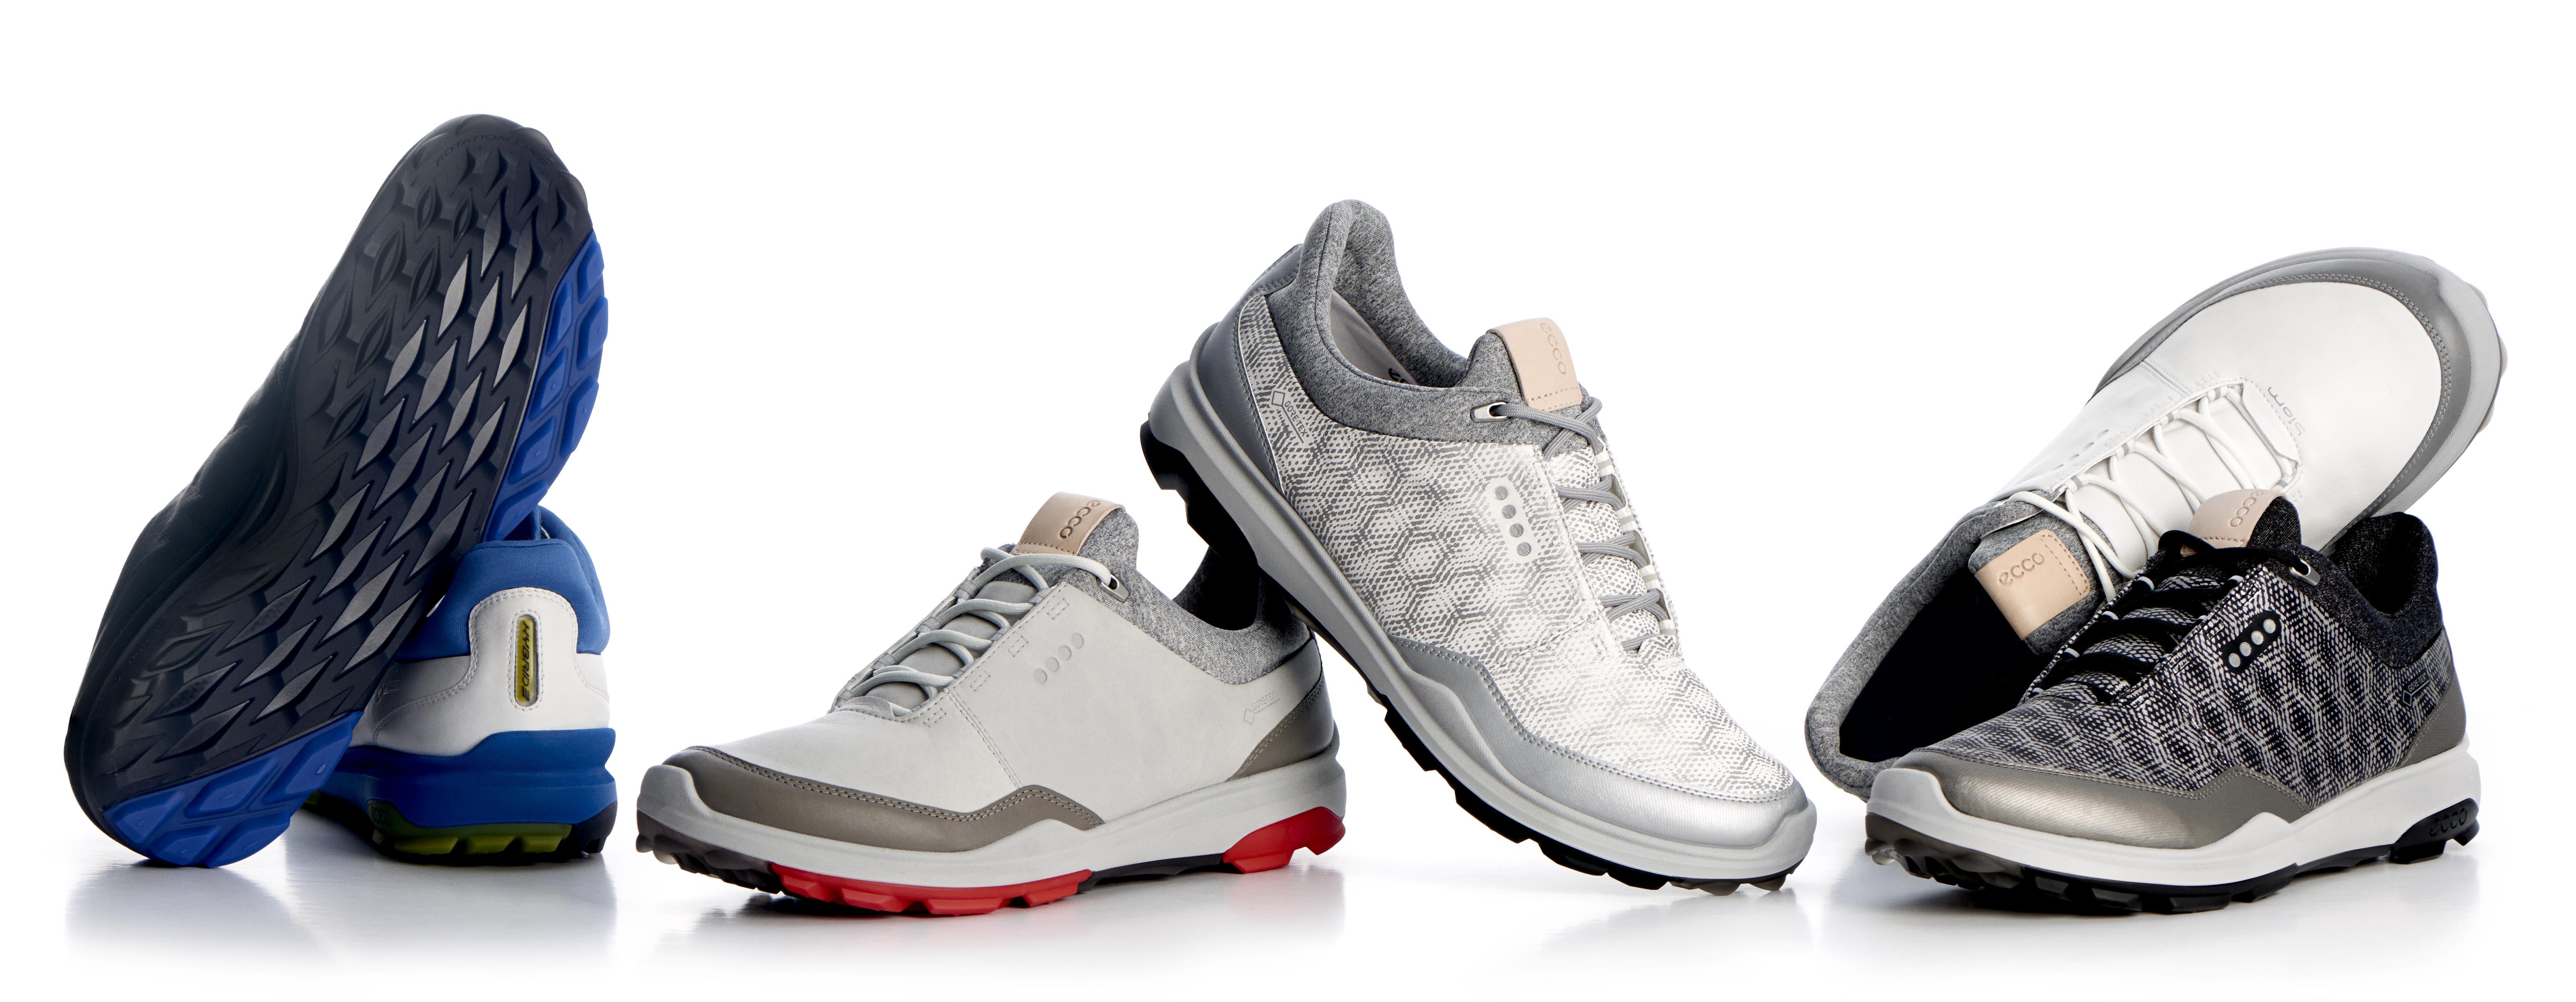 2bc5734bb7ae ECCO launches men s Biom Hybrid 3 golf shoe